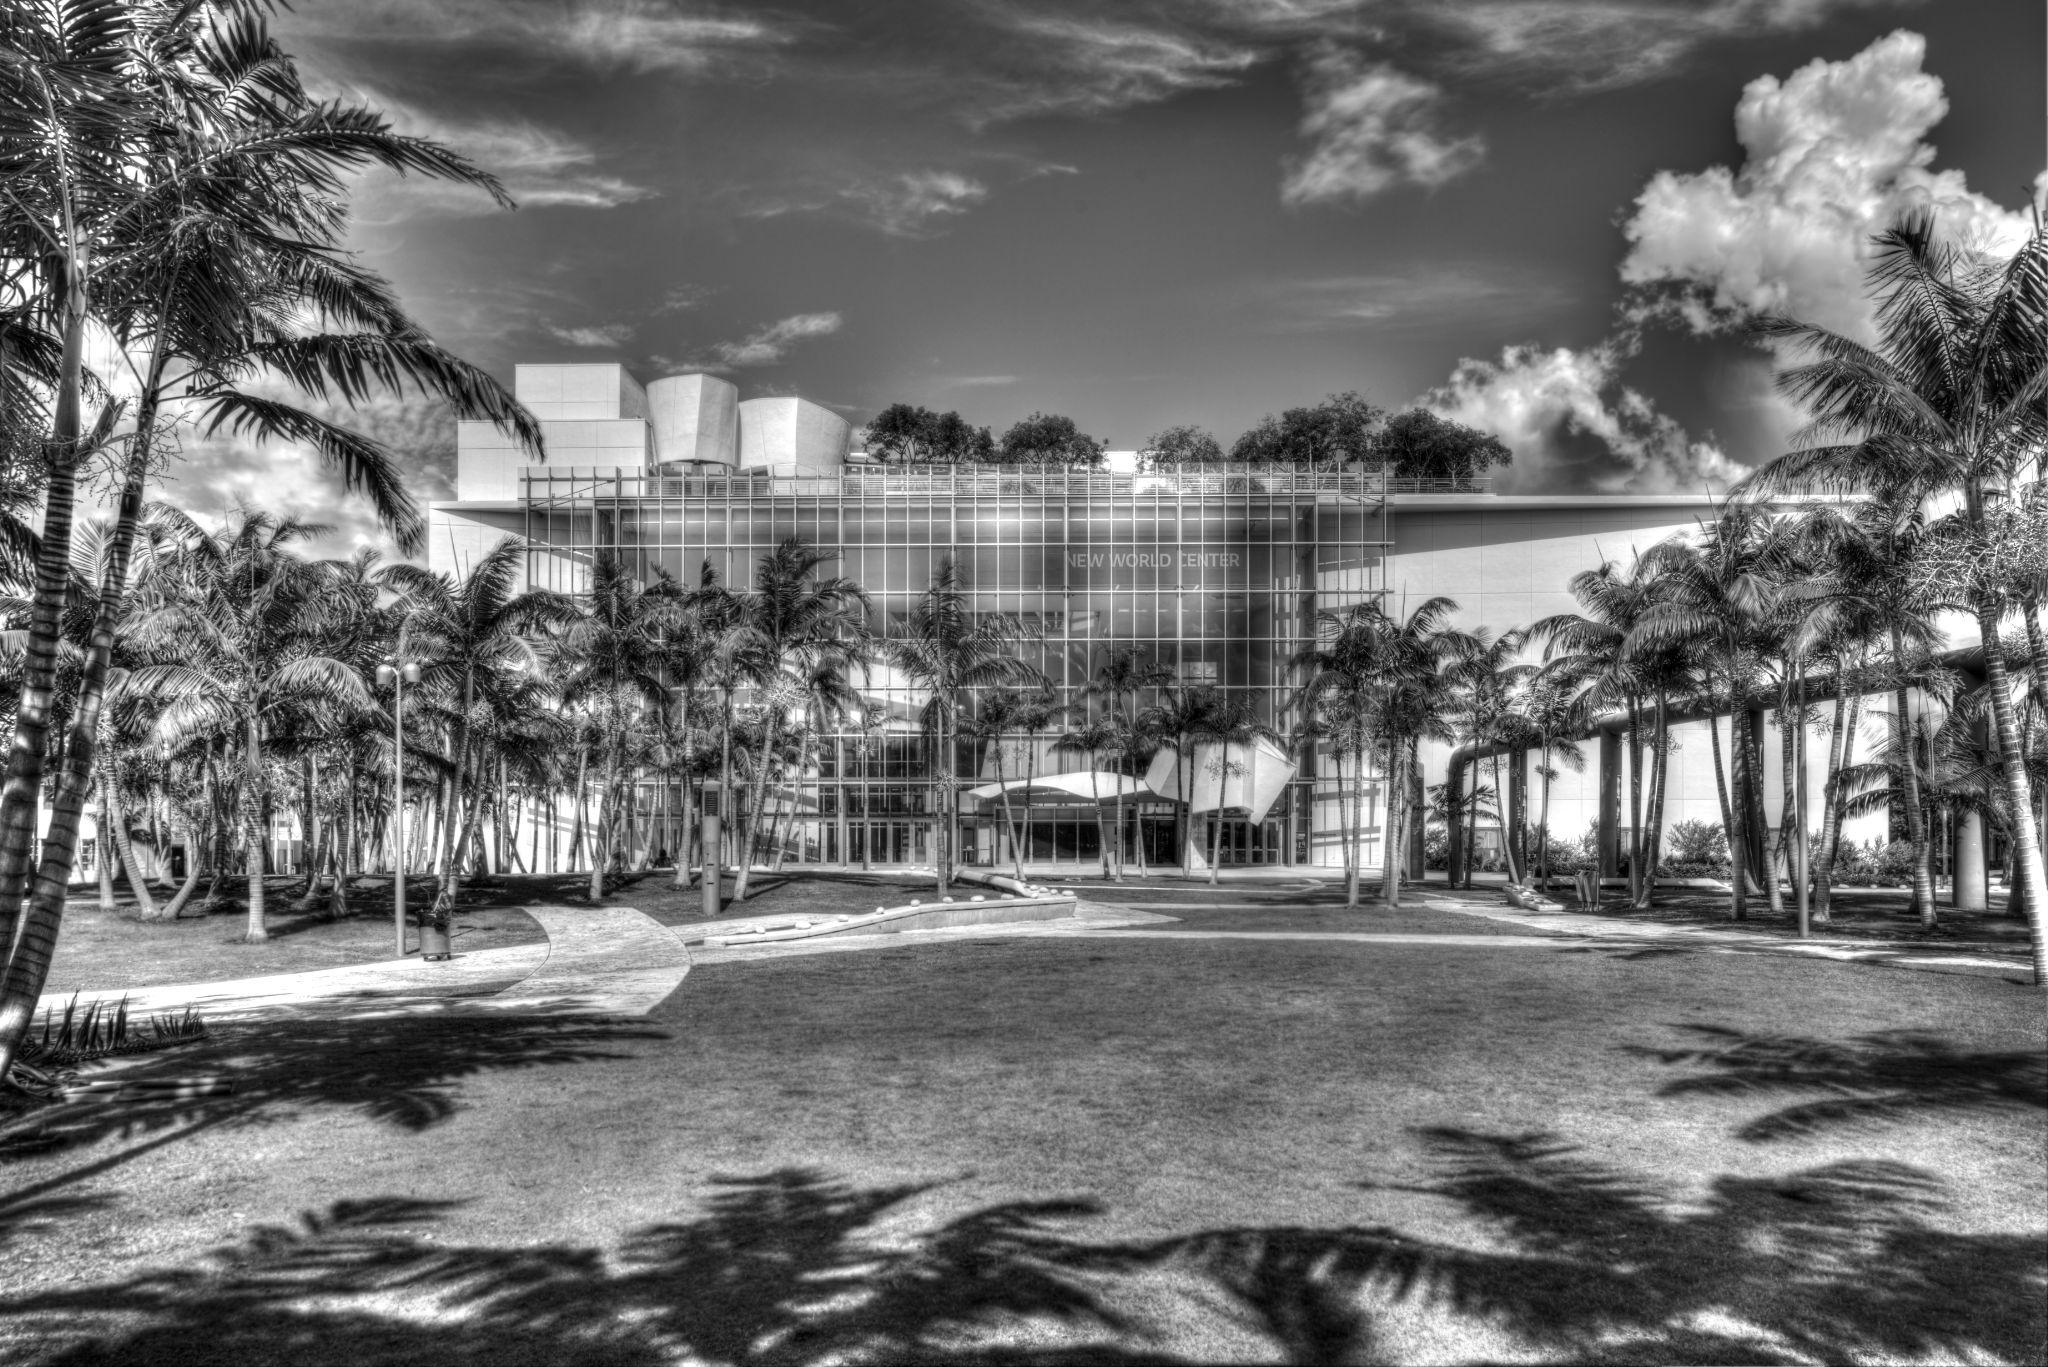 Opera House, Miami Beach by Bosko Ris